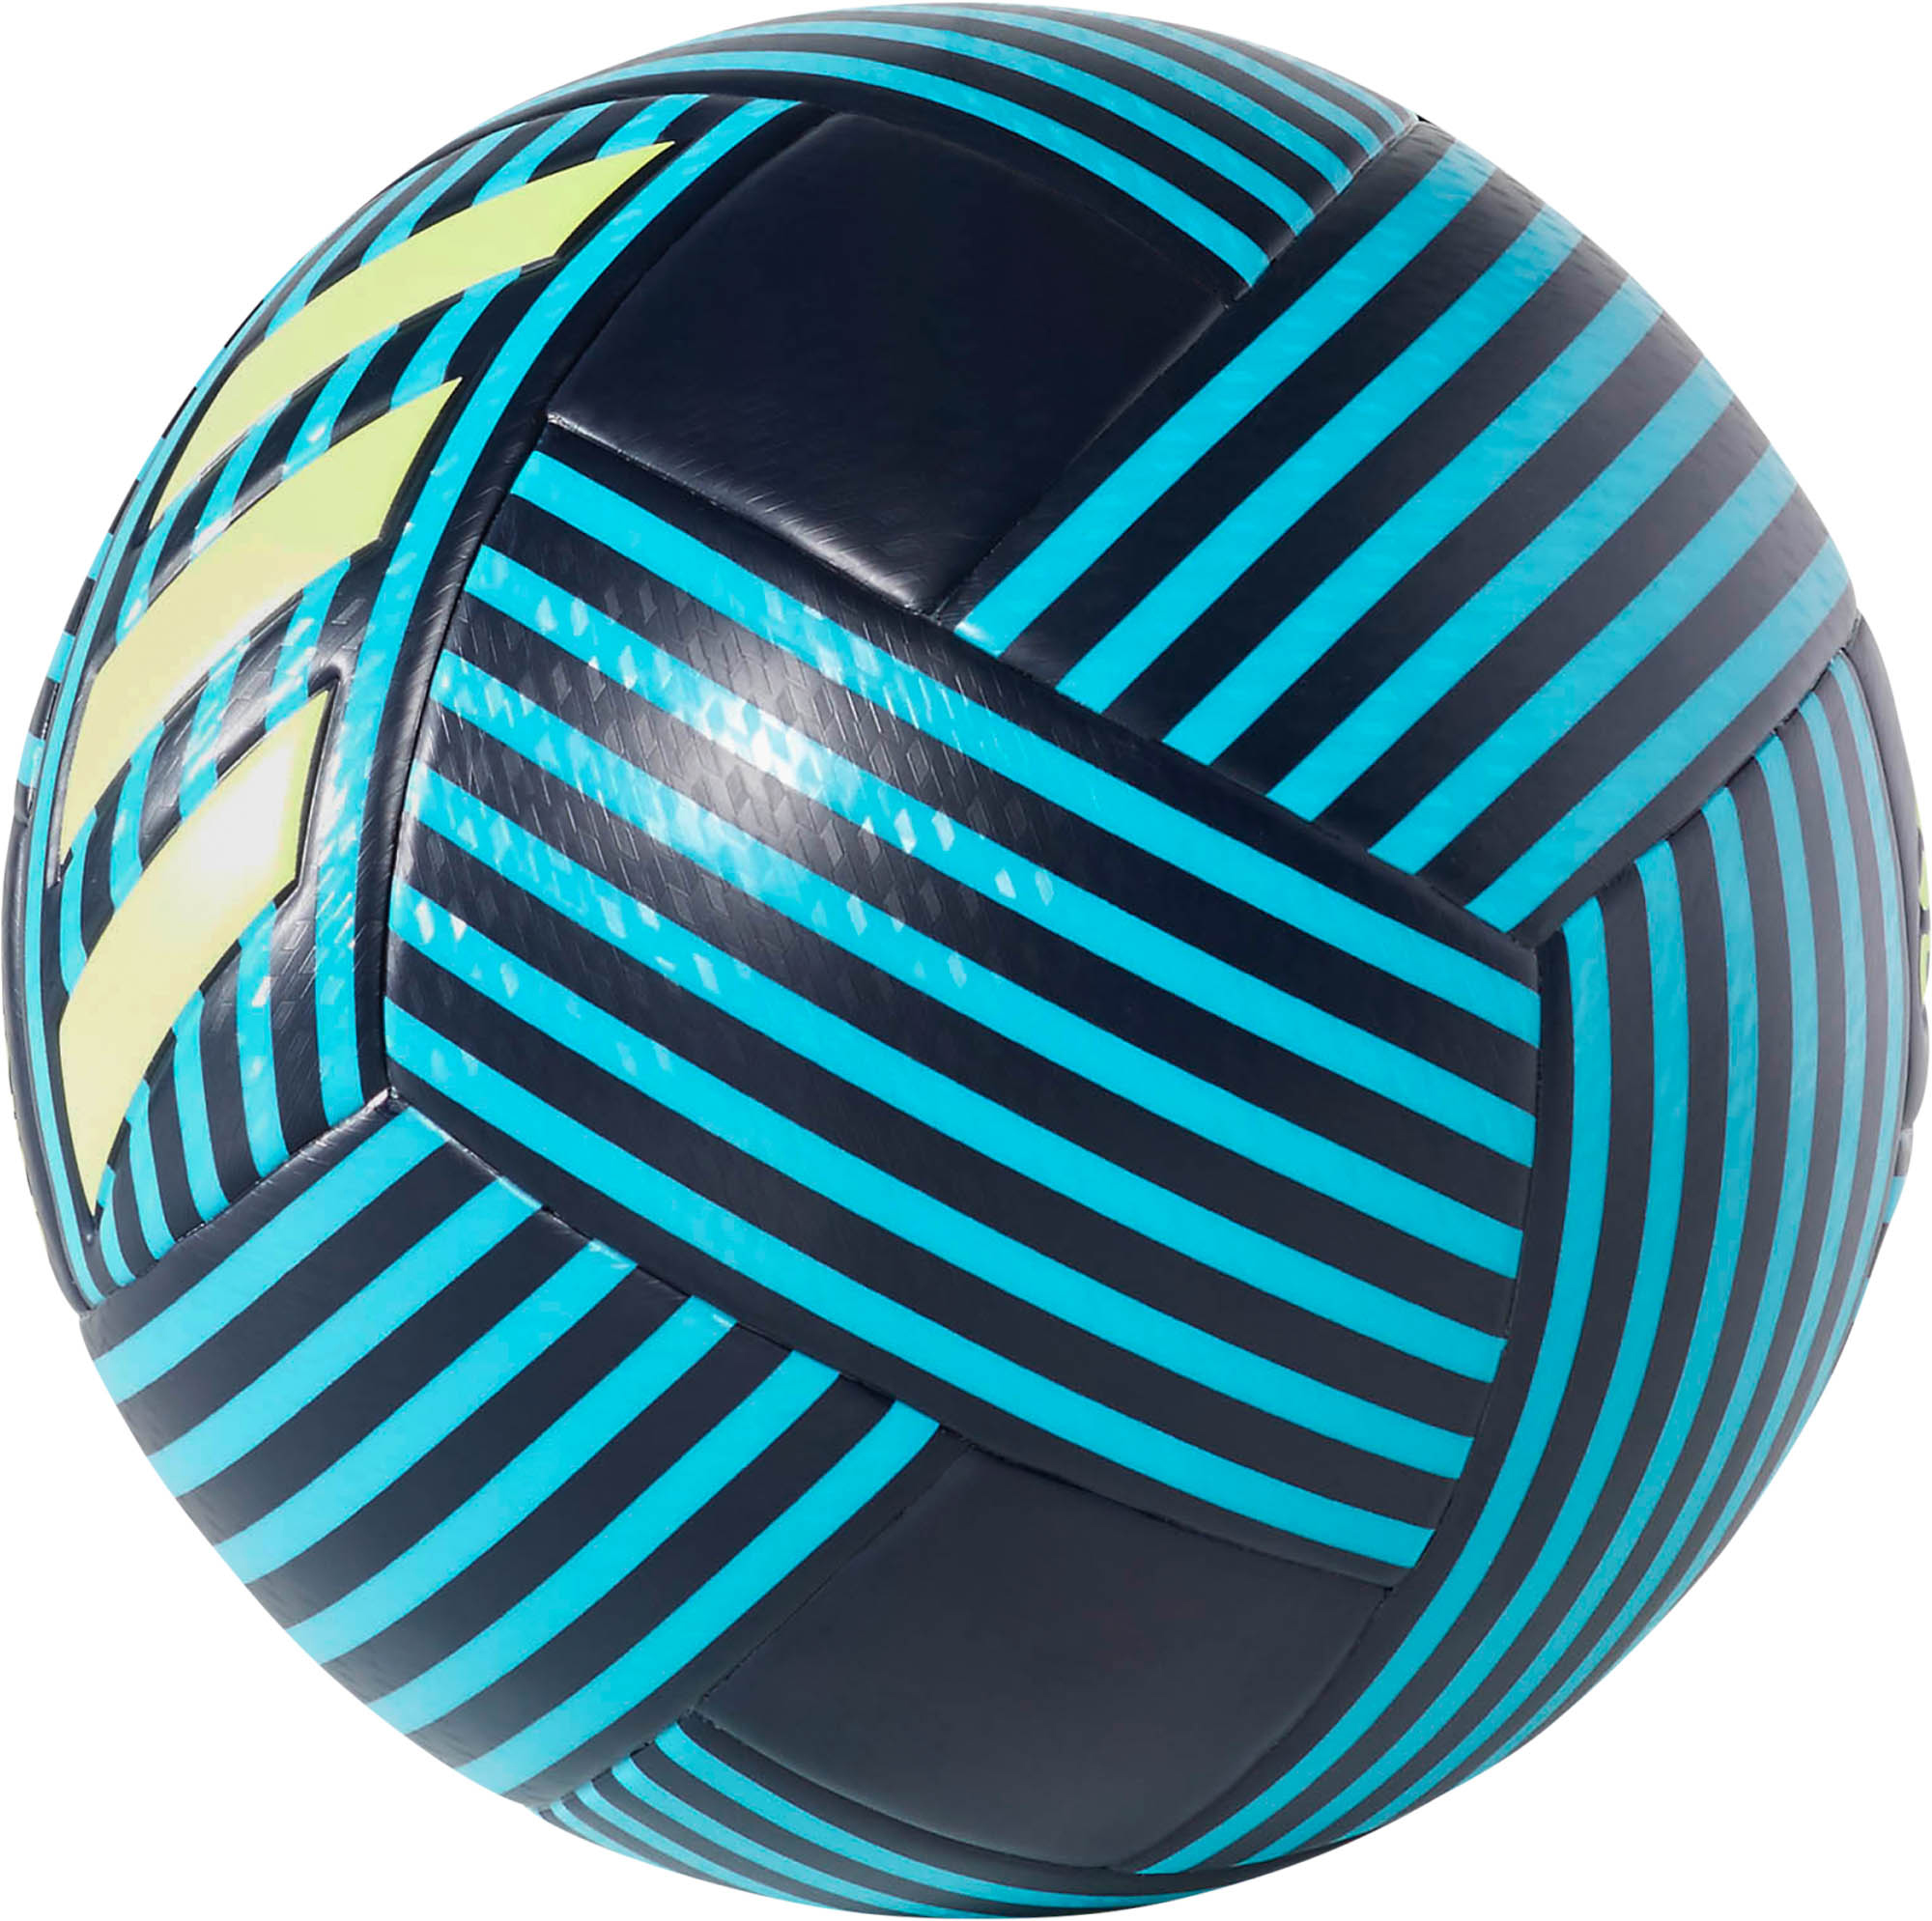 adidas Nemeziz Soccer Ball - Black